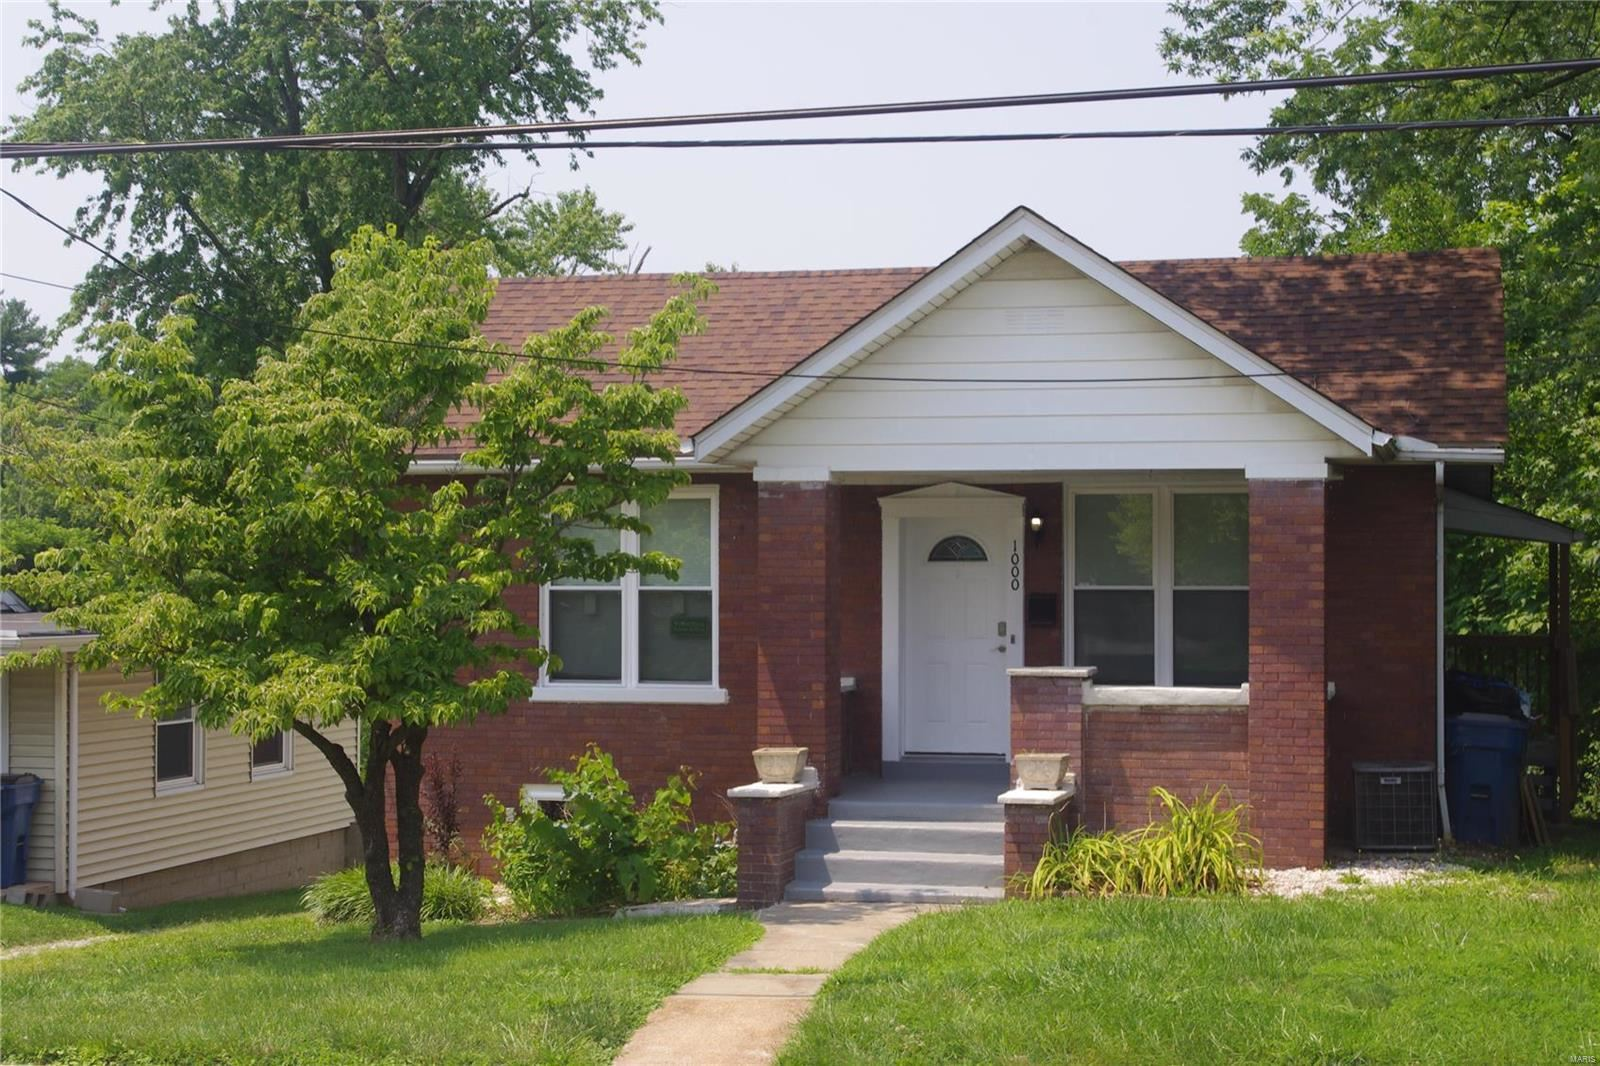 1000 N Keebler Avenue, Collinsville, IL 62234 - MLS#: 21053887